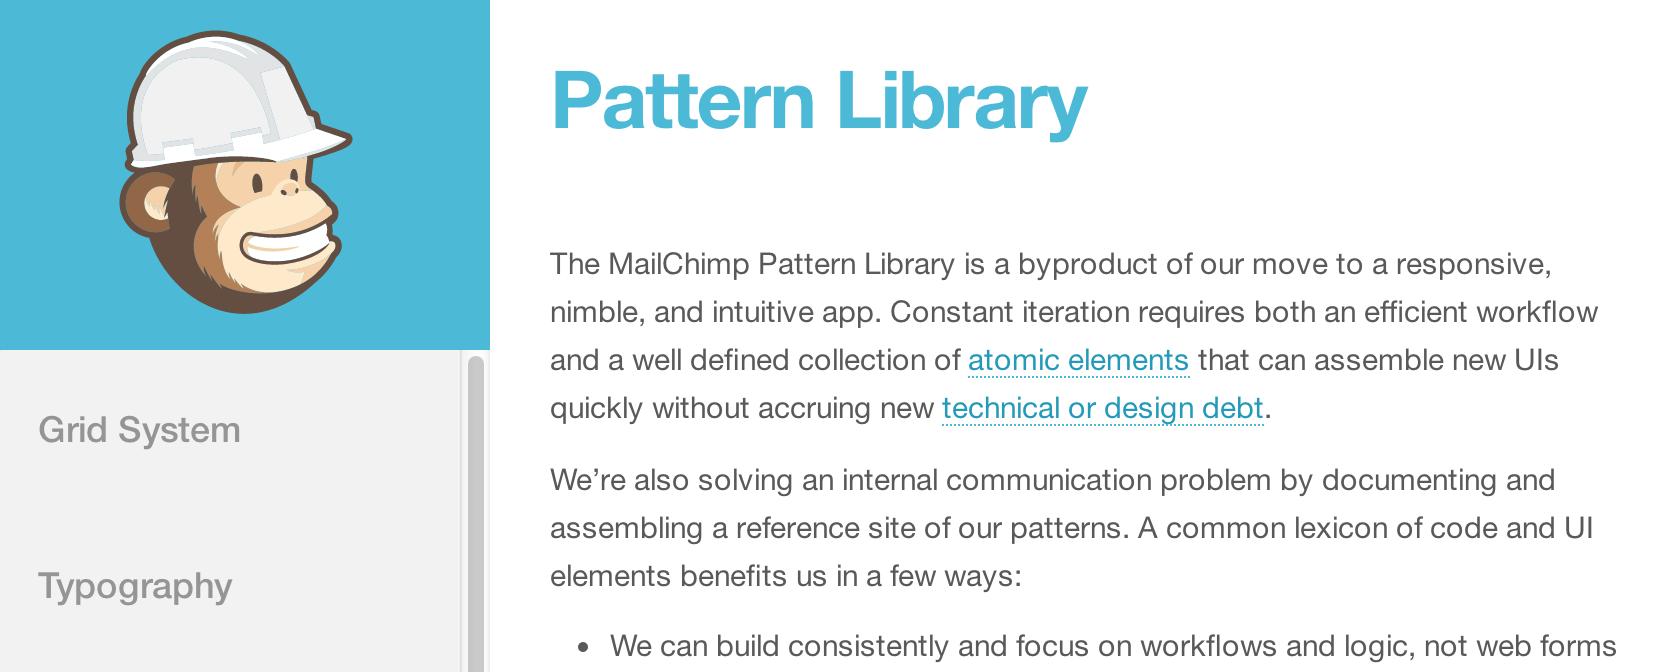 Pattern_Library___MailChimp